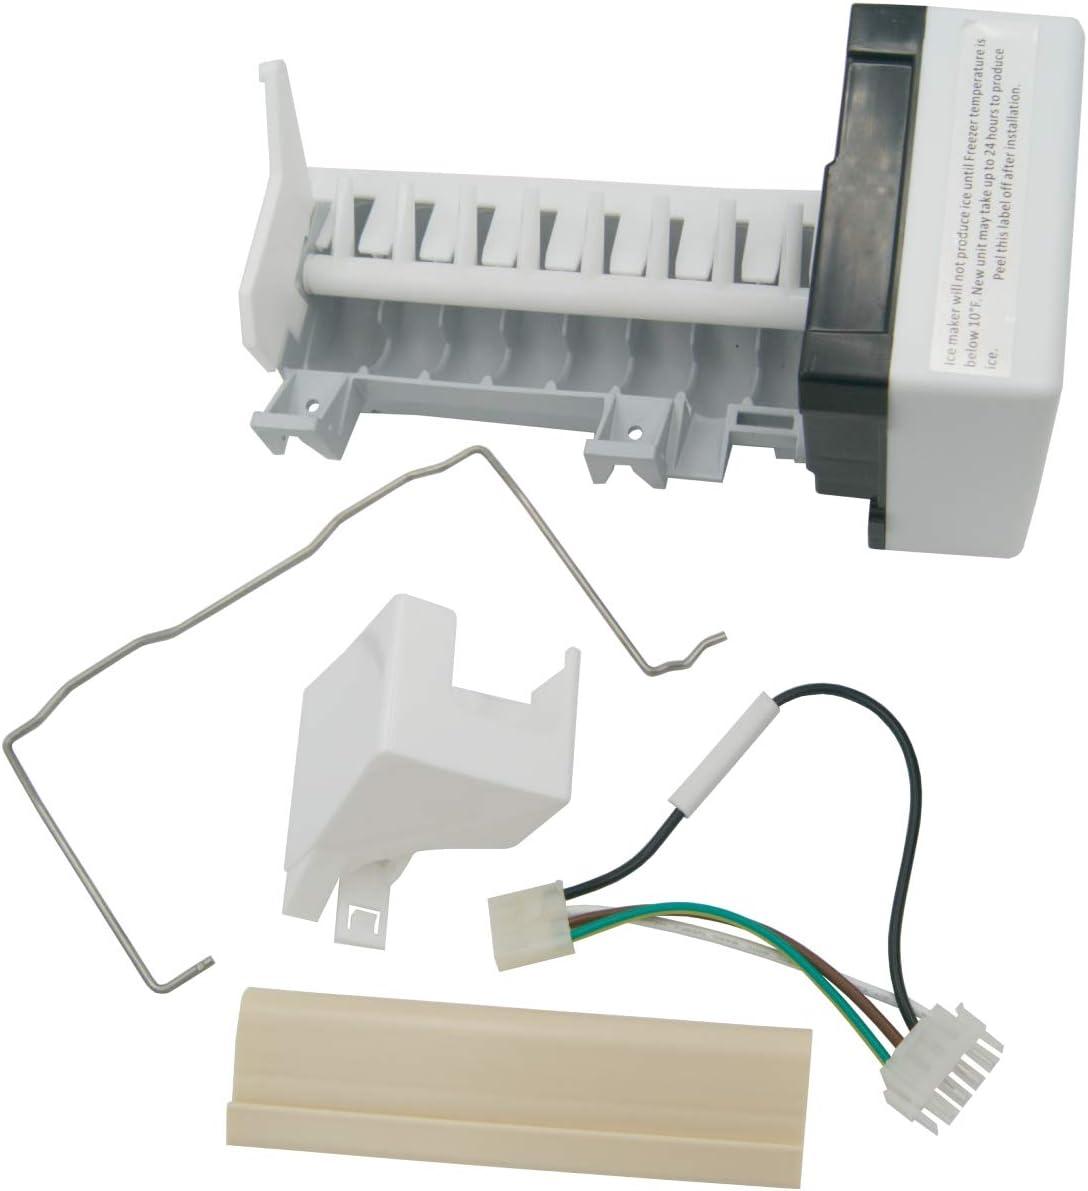 Supplying Demand 5303918344 Refrigerator Freezer Ice Maker Fits